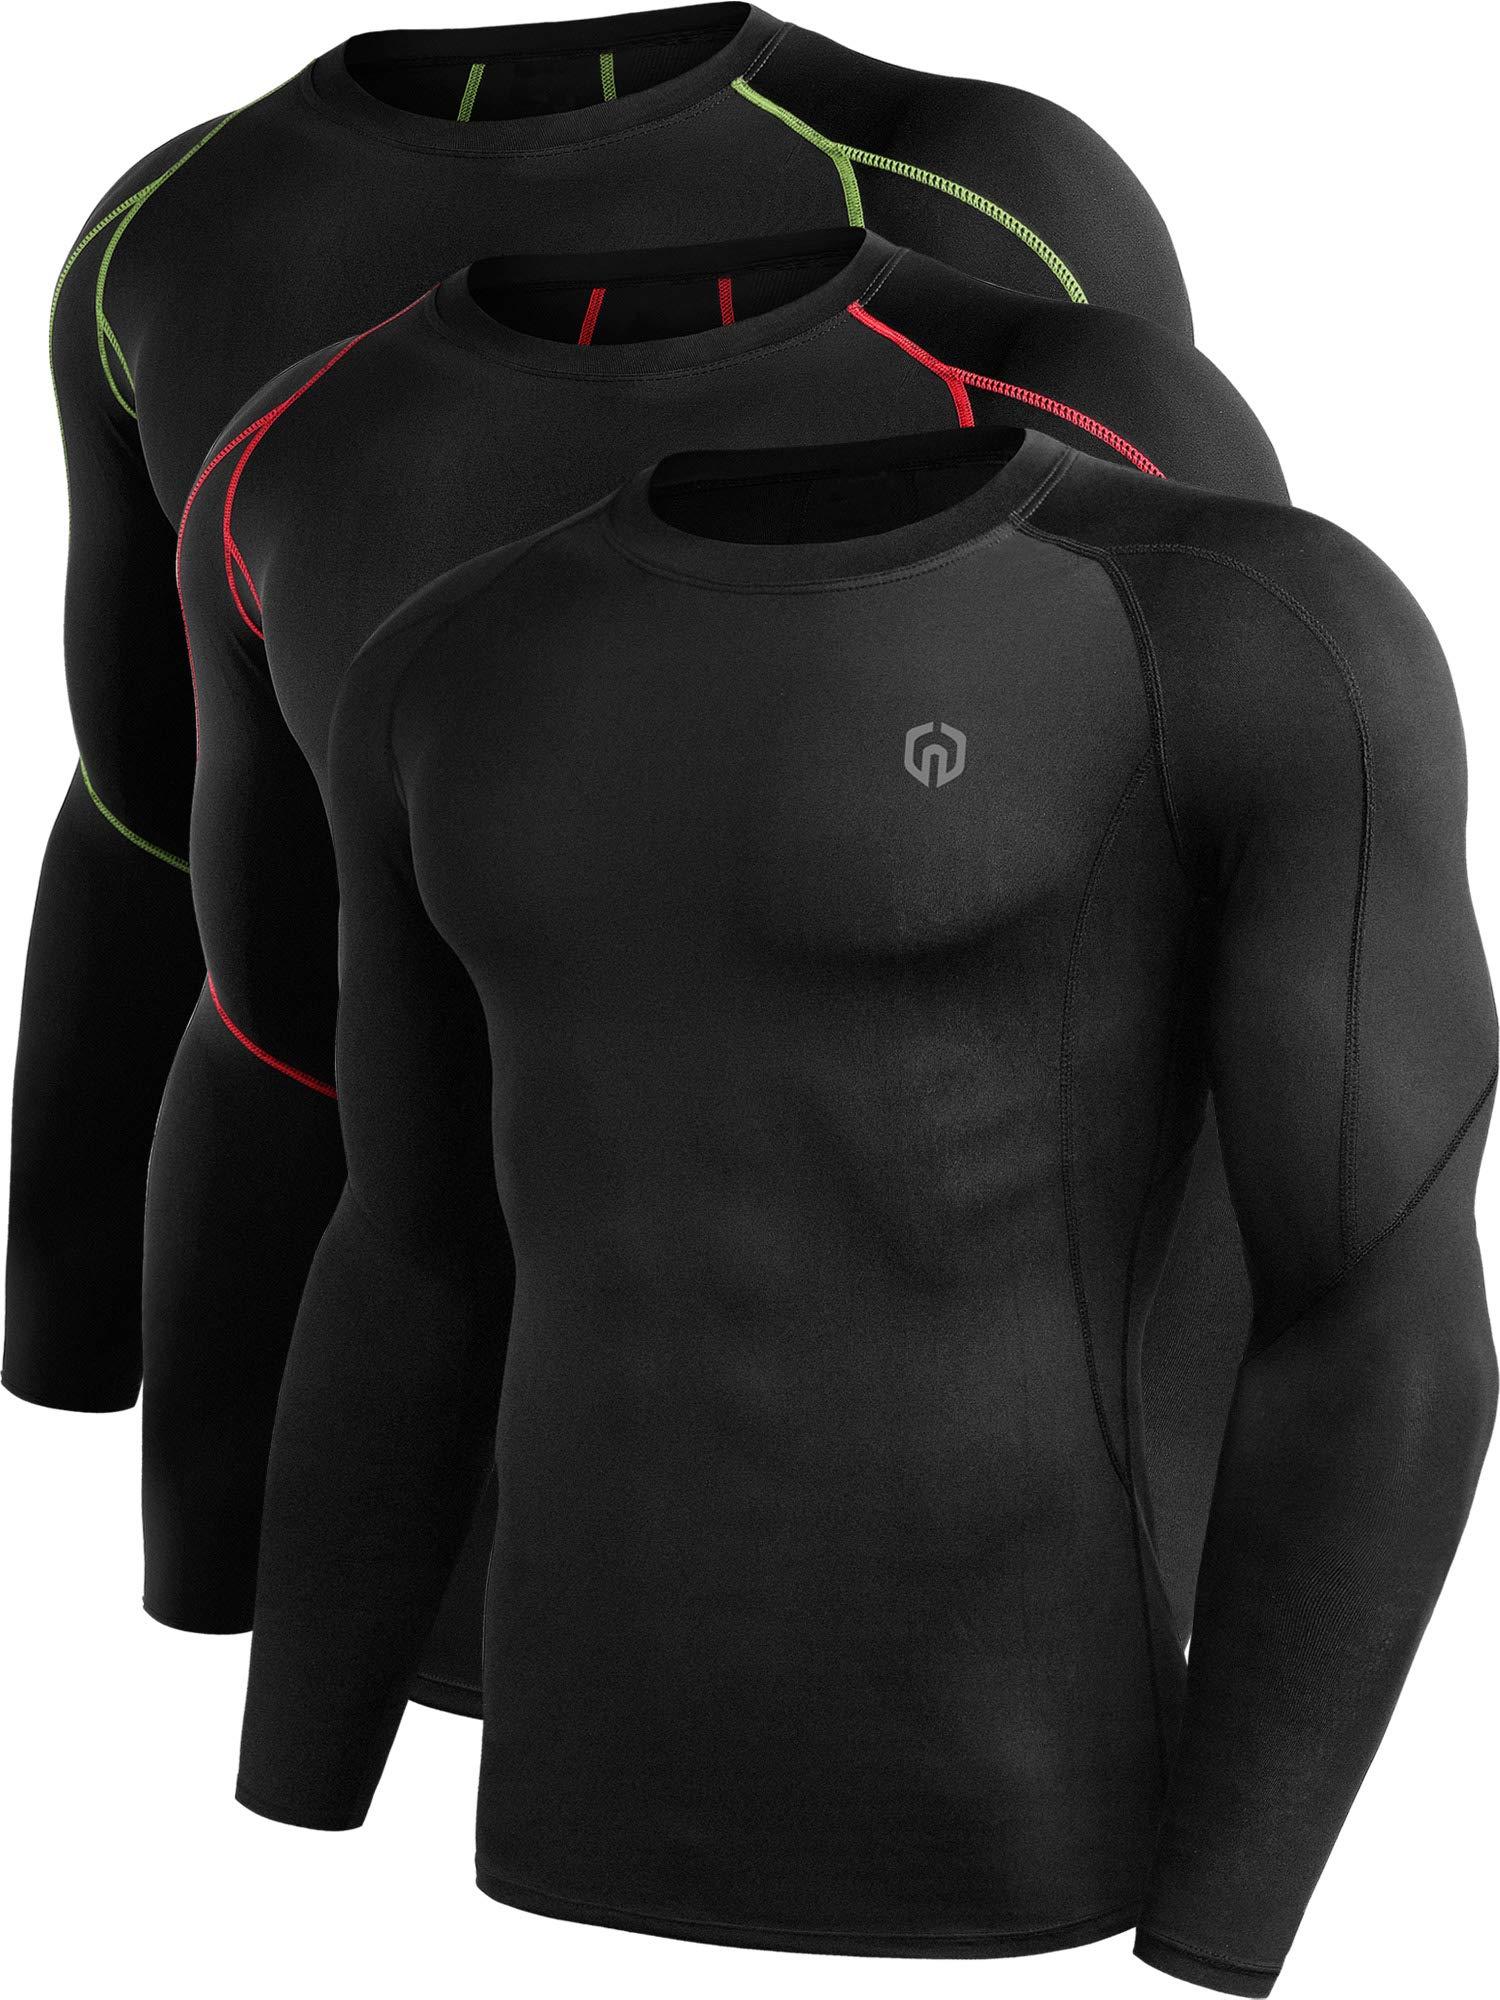 Neleus Men's 3 Pack Compression Workout Long Sleeve Shirts,5030,Black,Red Stripe,Green Stripe,US 2XL,EU 3XL by Neleus